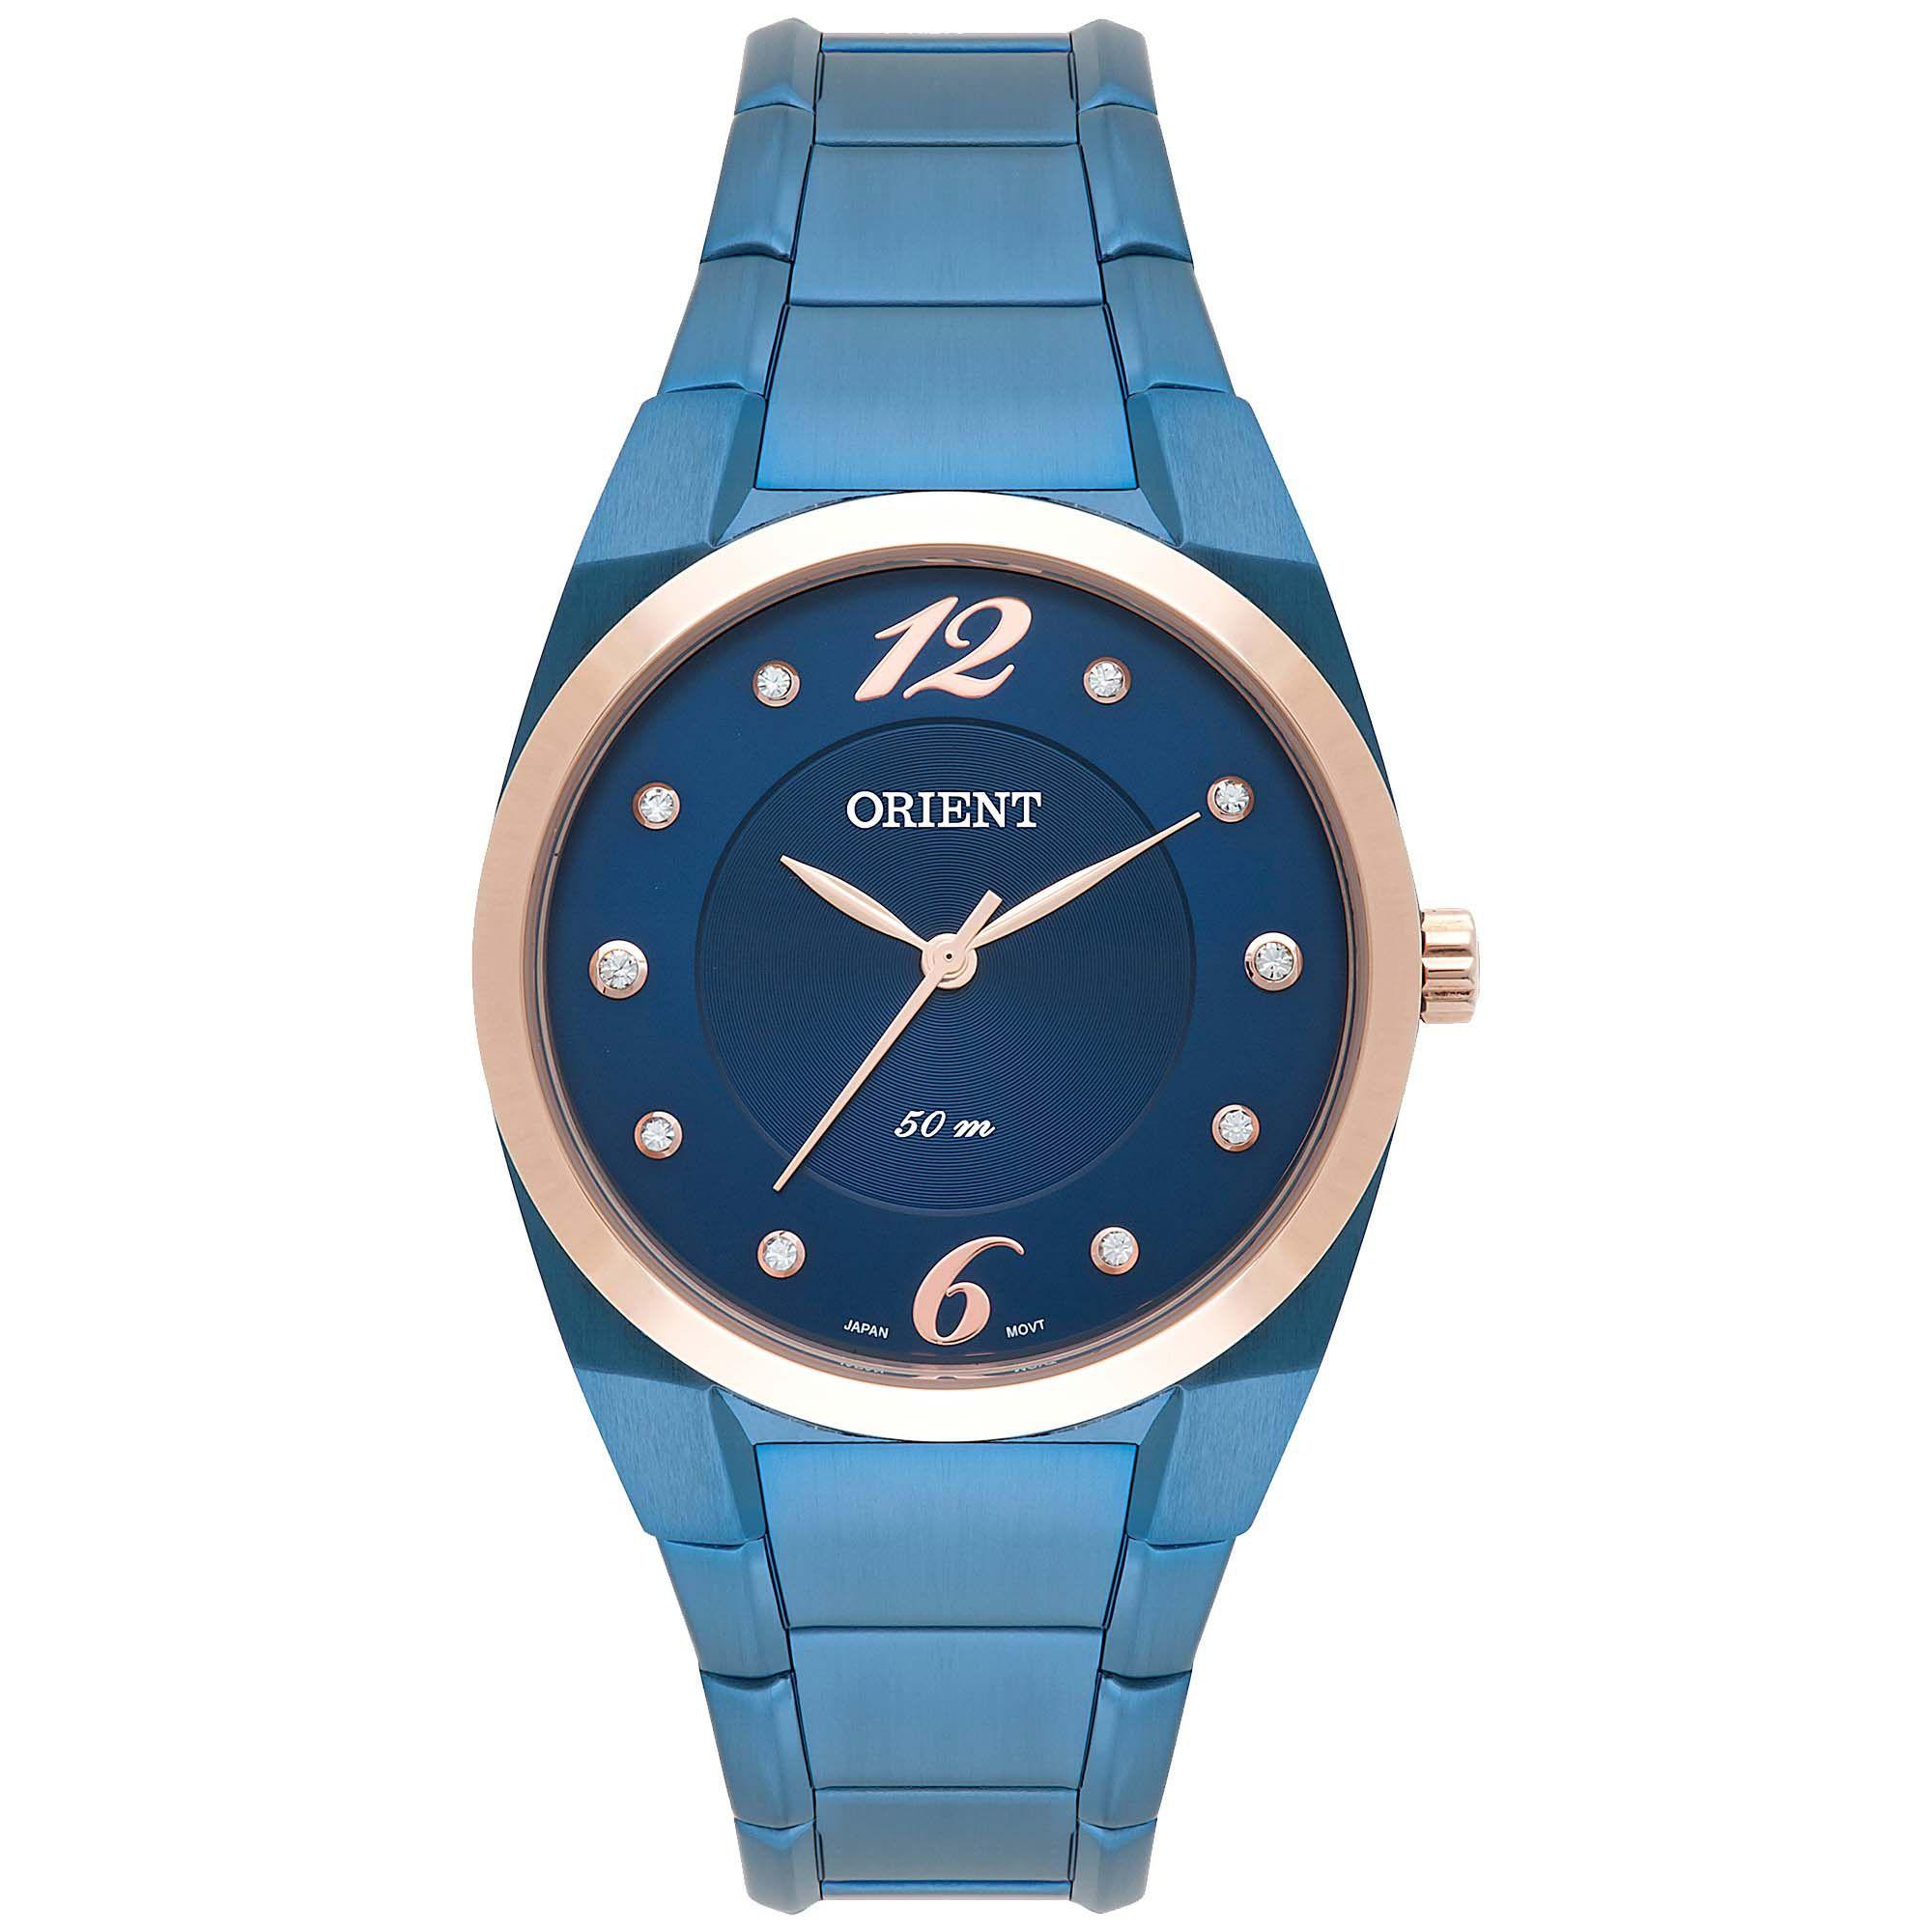 Relógio Feminino Orient FASS0001 D2DX